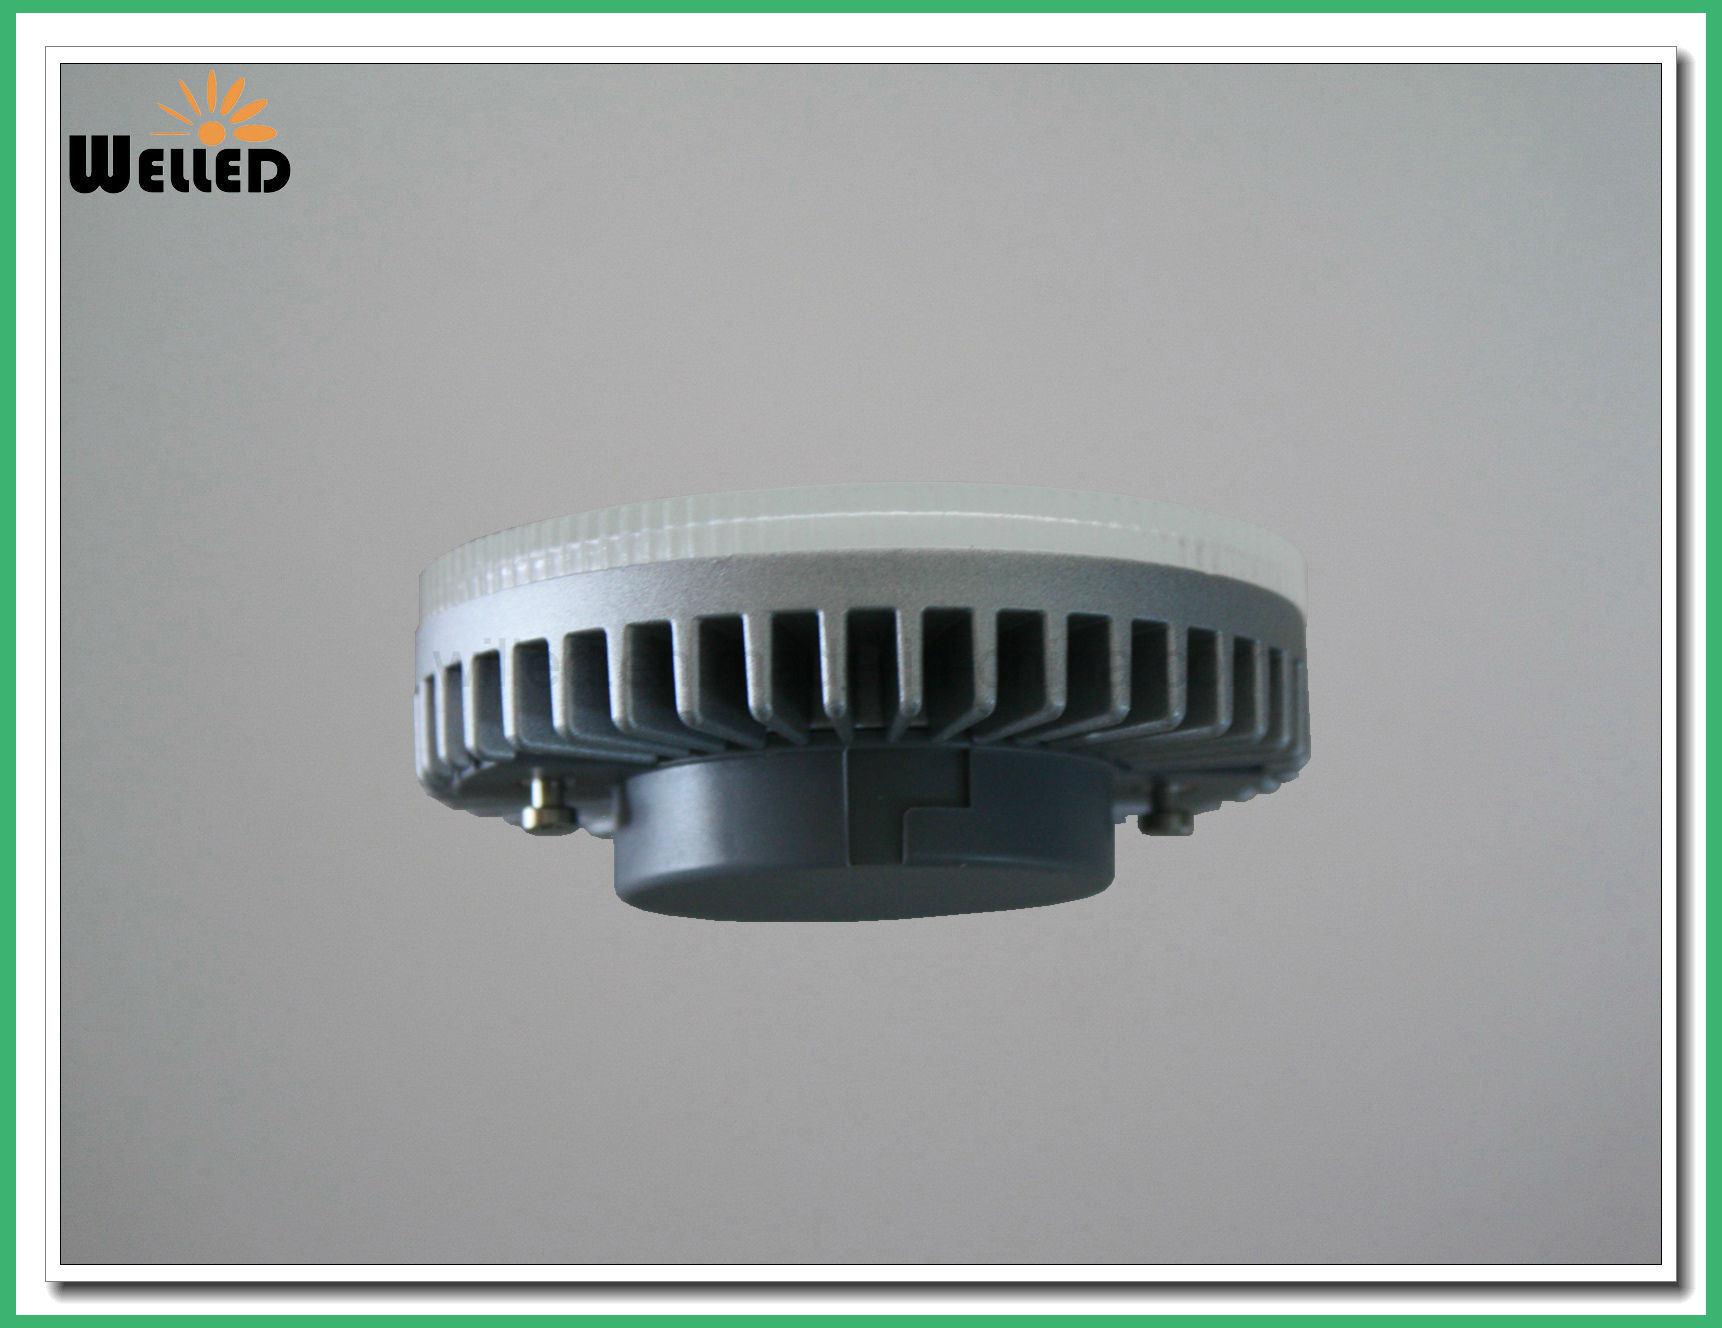 8W Aluminum LED Lamp Gx53 for Under Cabinet Light